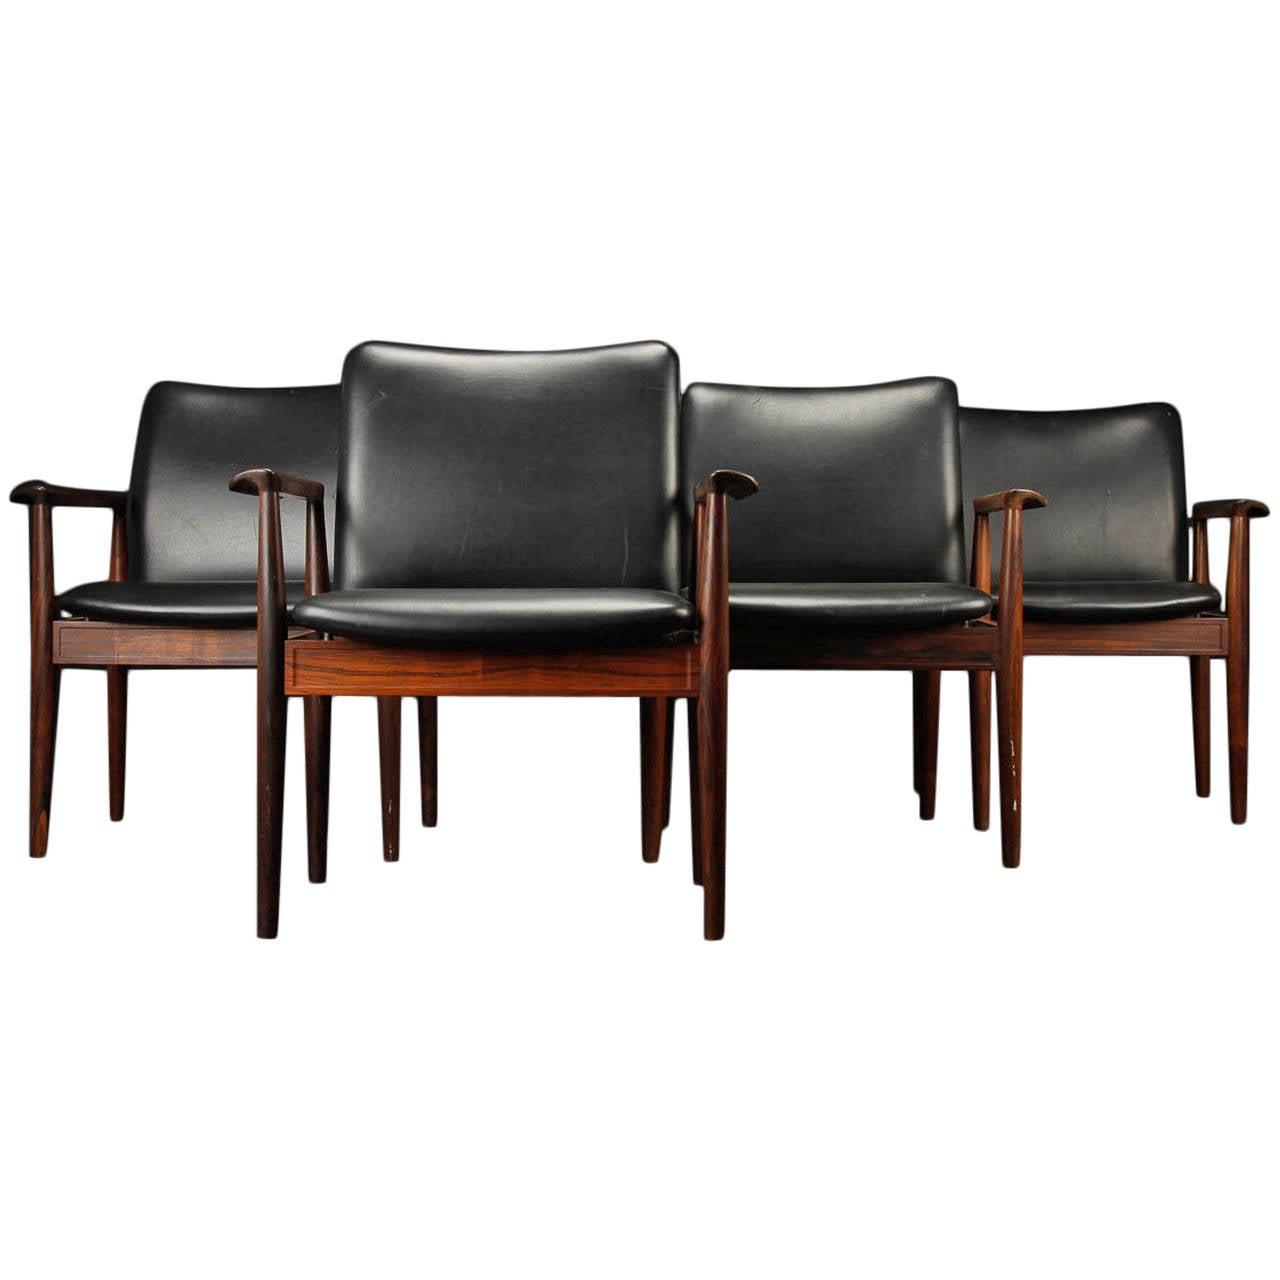 Finn Juhl Diplomat Chairs